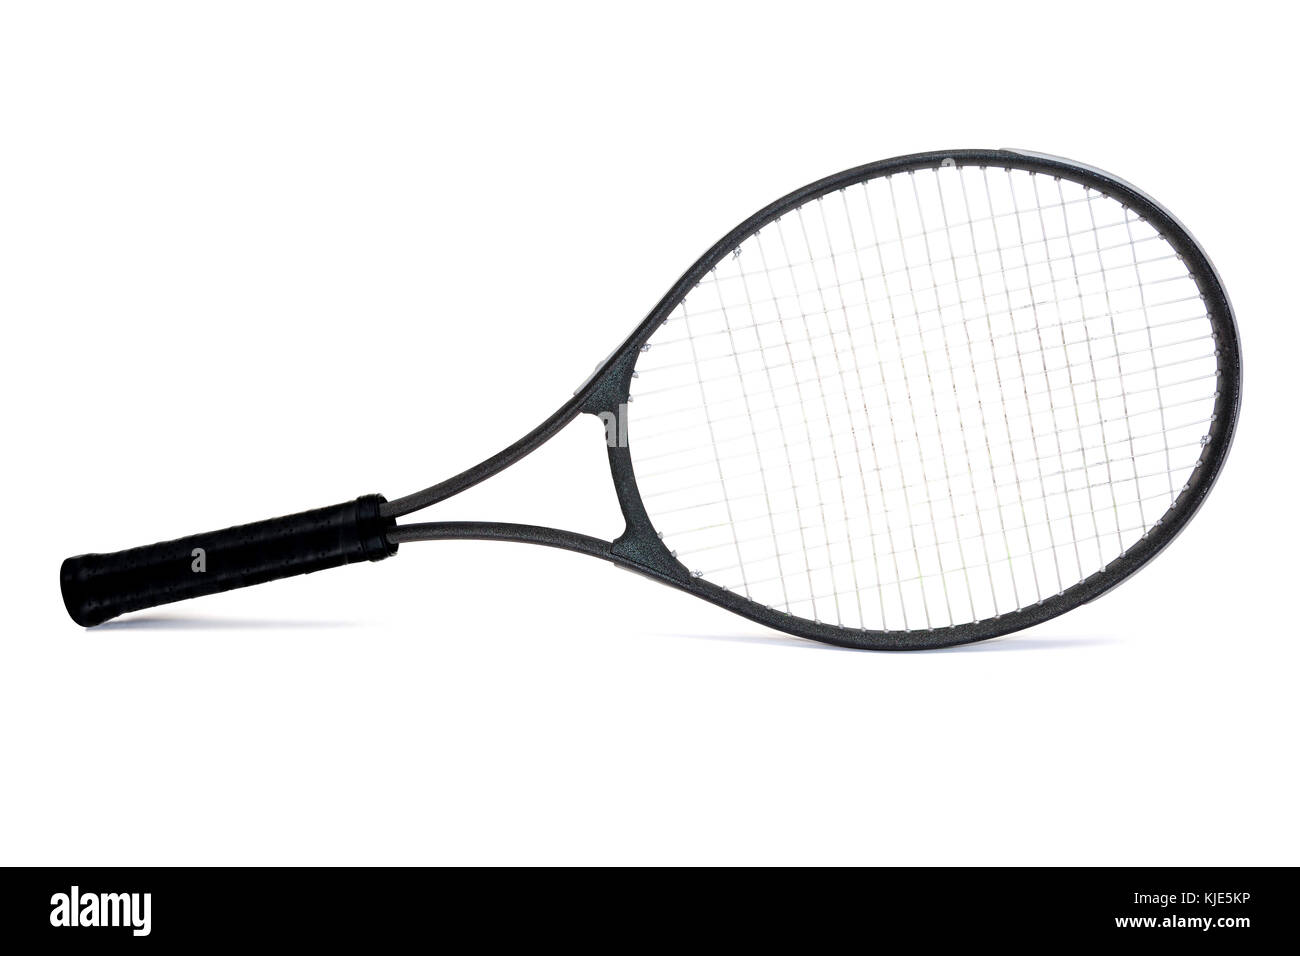 Raqueta de tenis grafito negro sazonado aislado sobre fondo blanco. Imagen De Stock